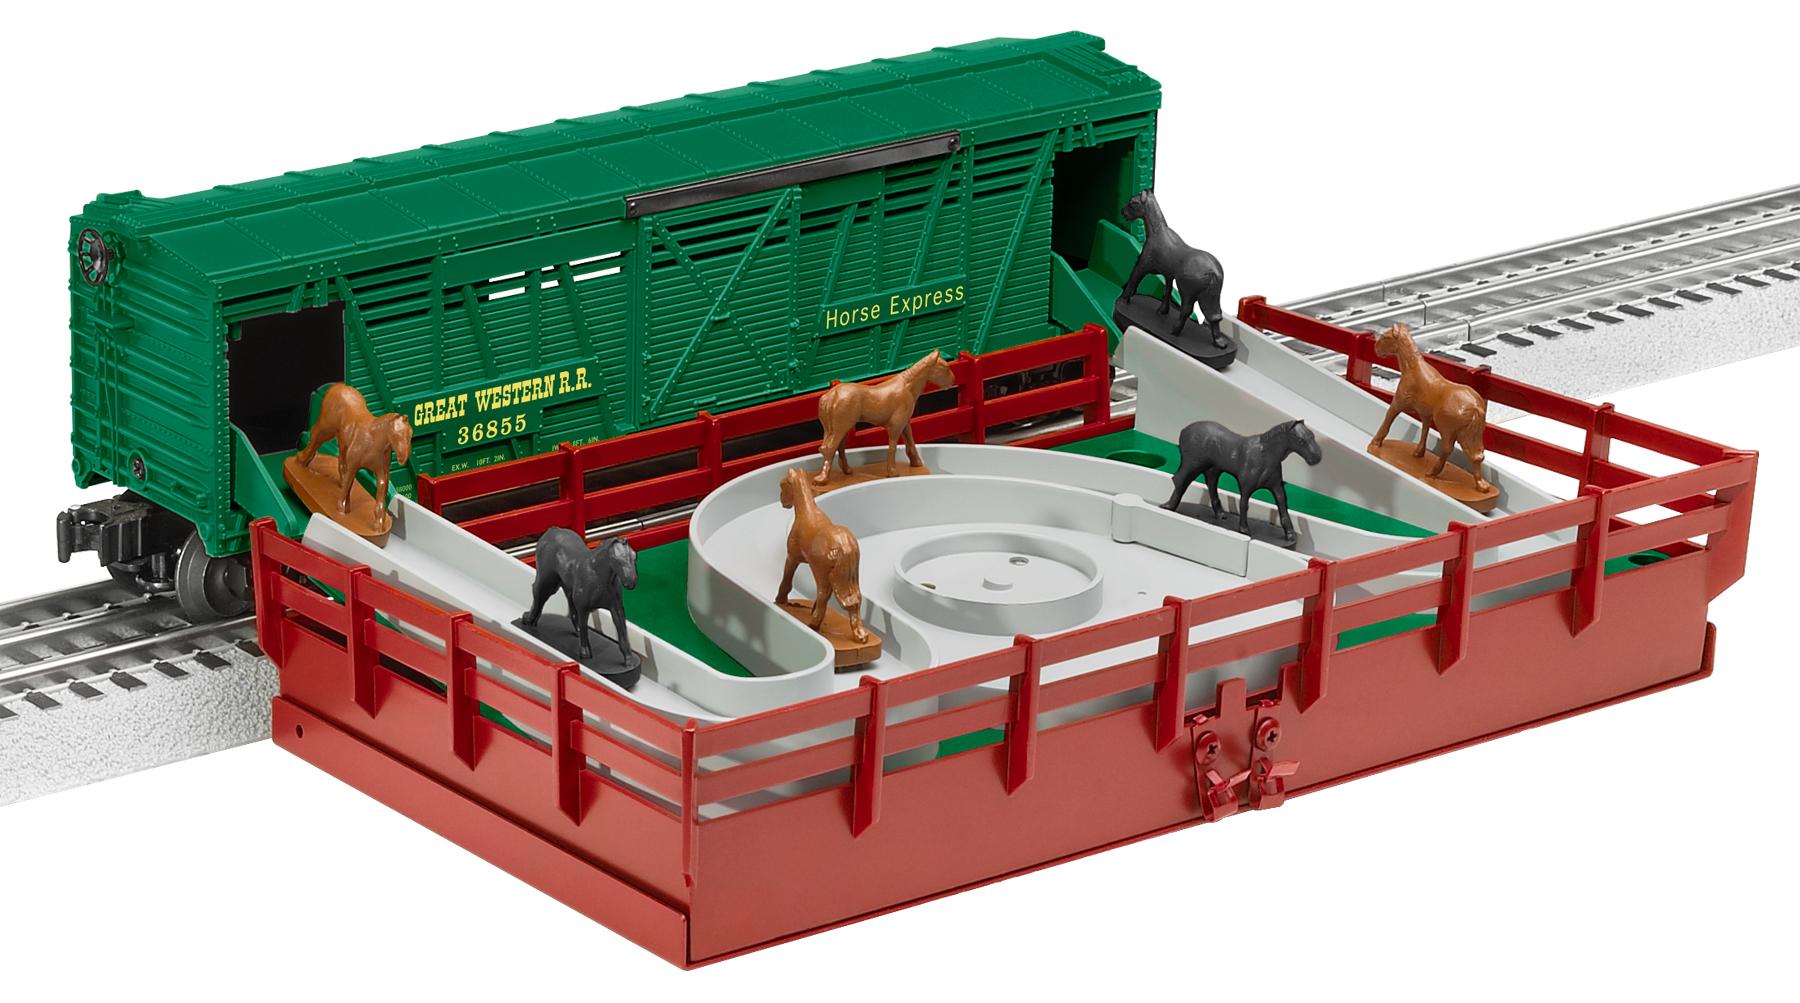 Wiring Diagram Lionel Cattle Car : Turntable lionel trains